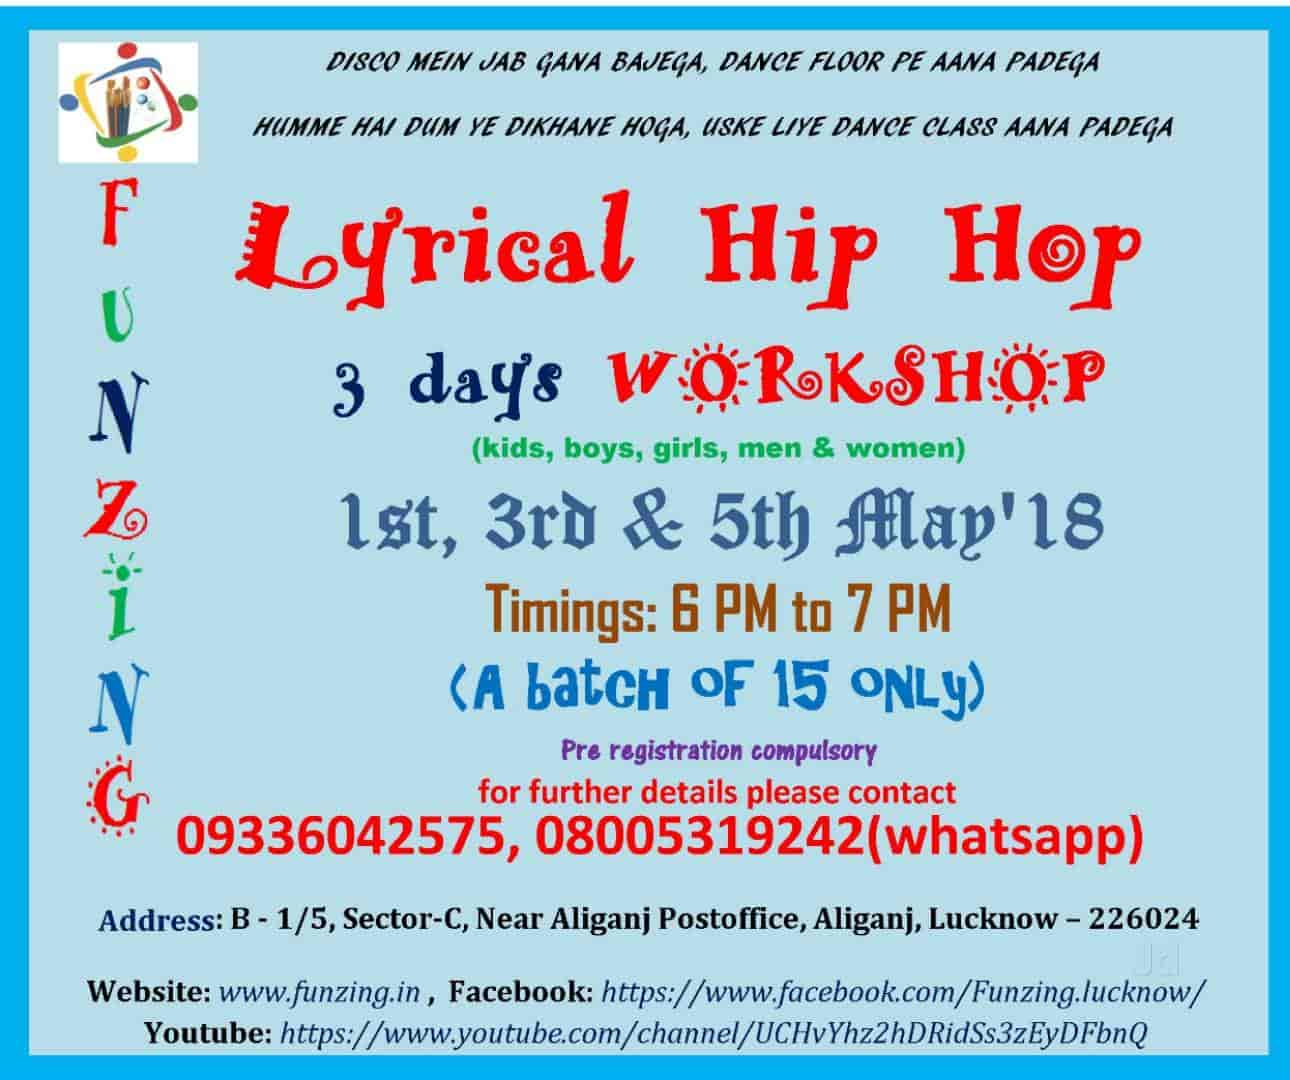 Funzing The Kids Club, Aliganj - Dance Classes in Lucknow